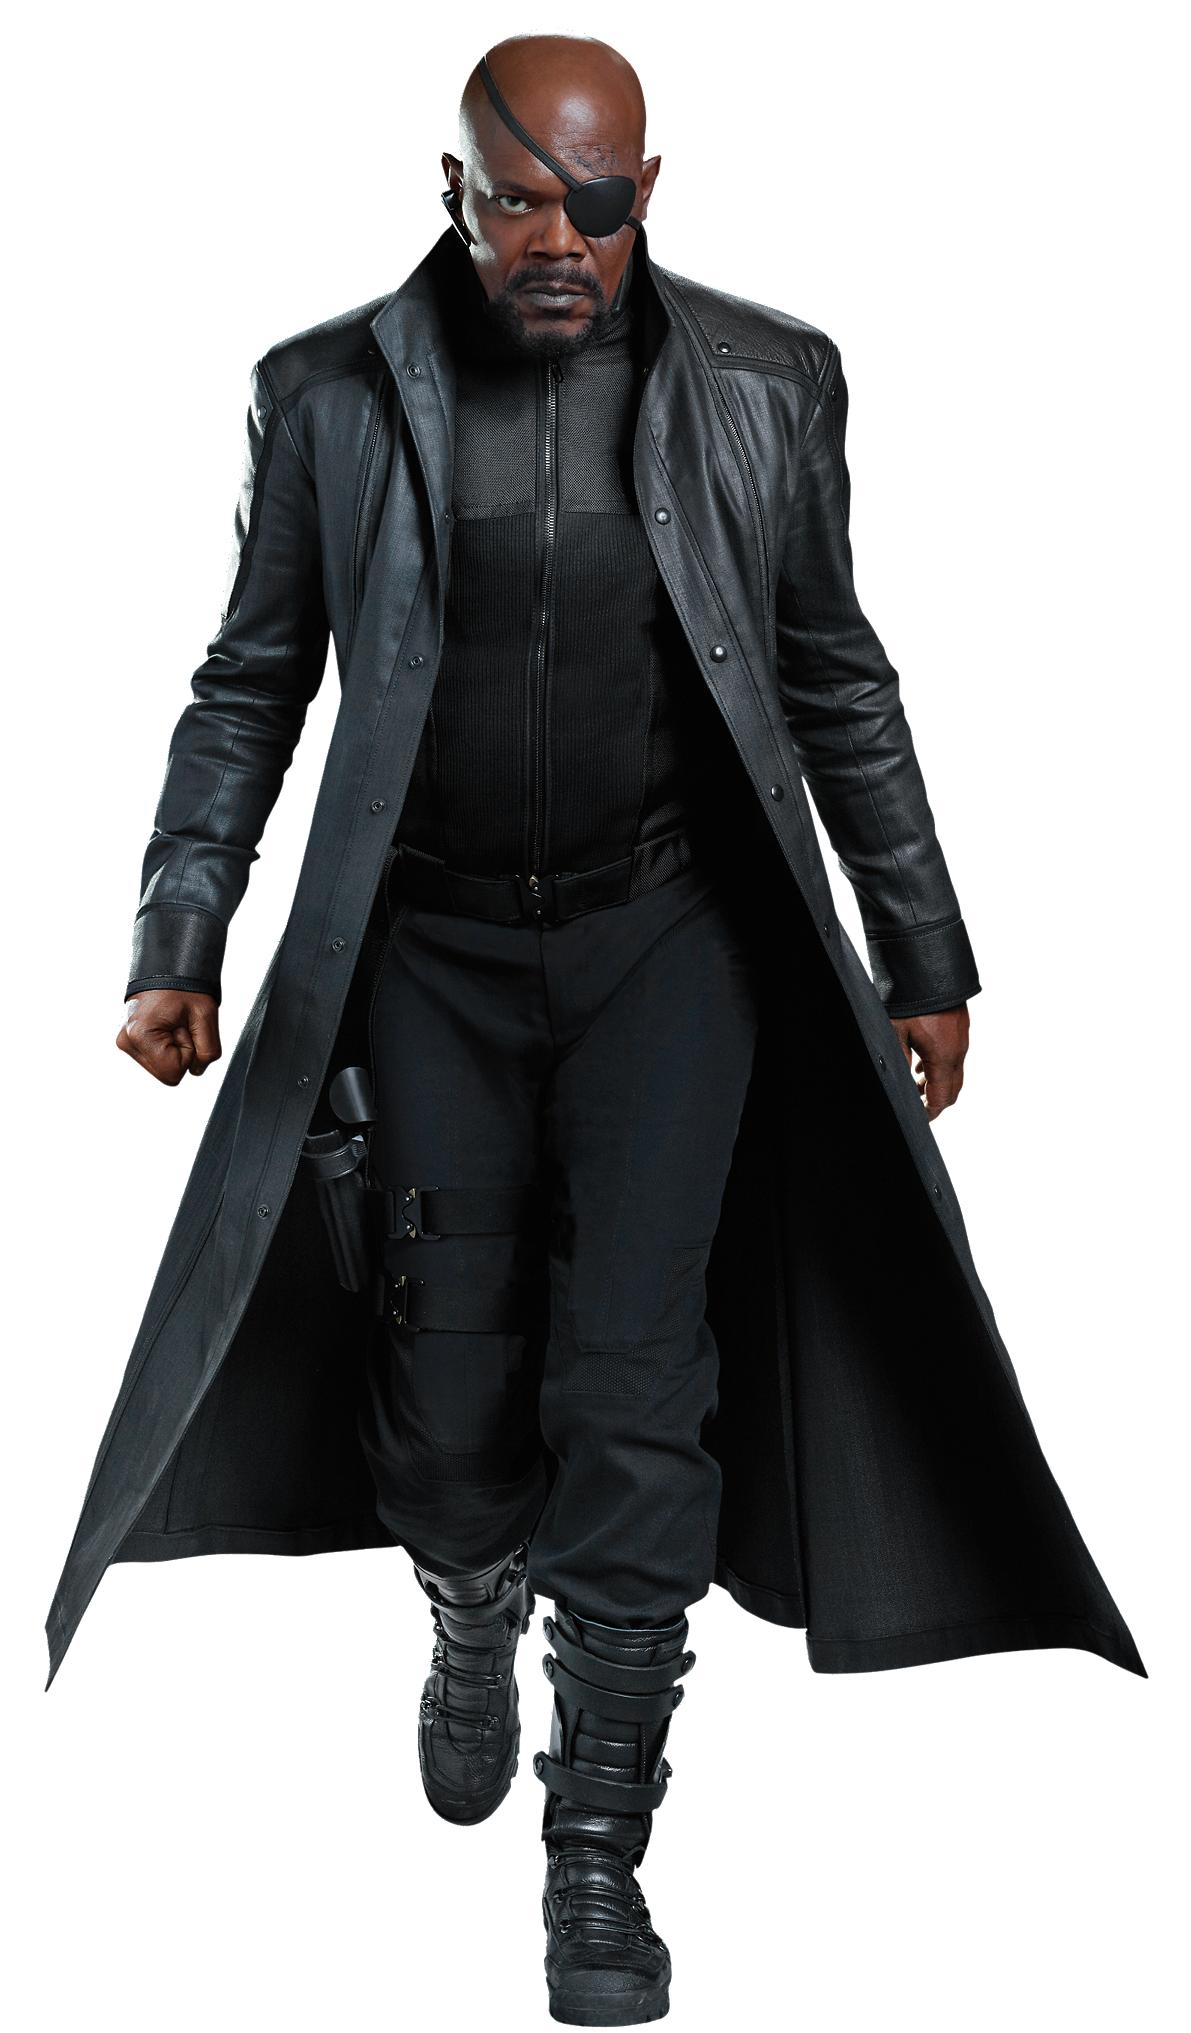 Nick Fury Disneywiki Nick Fury Disfraces Marvel Personajes Avengers